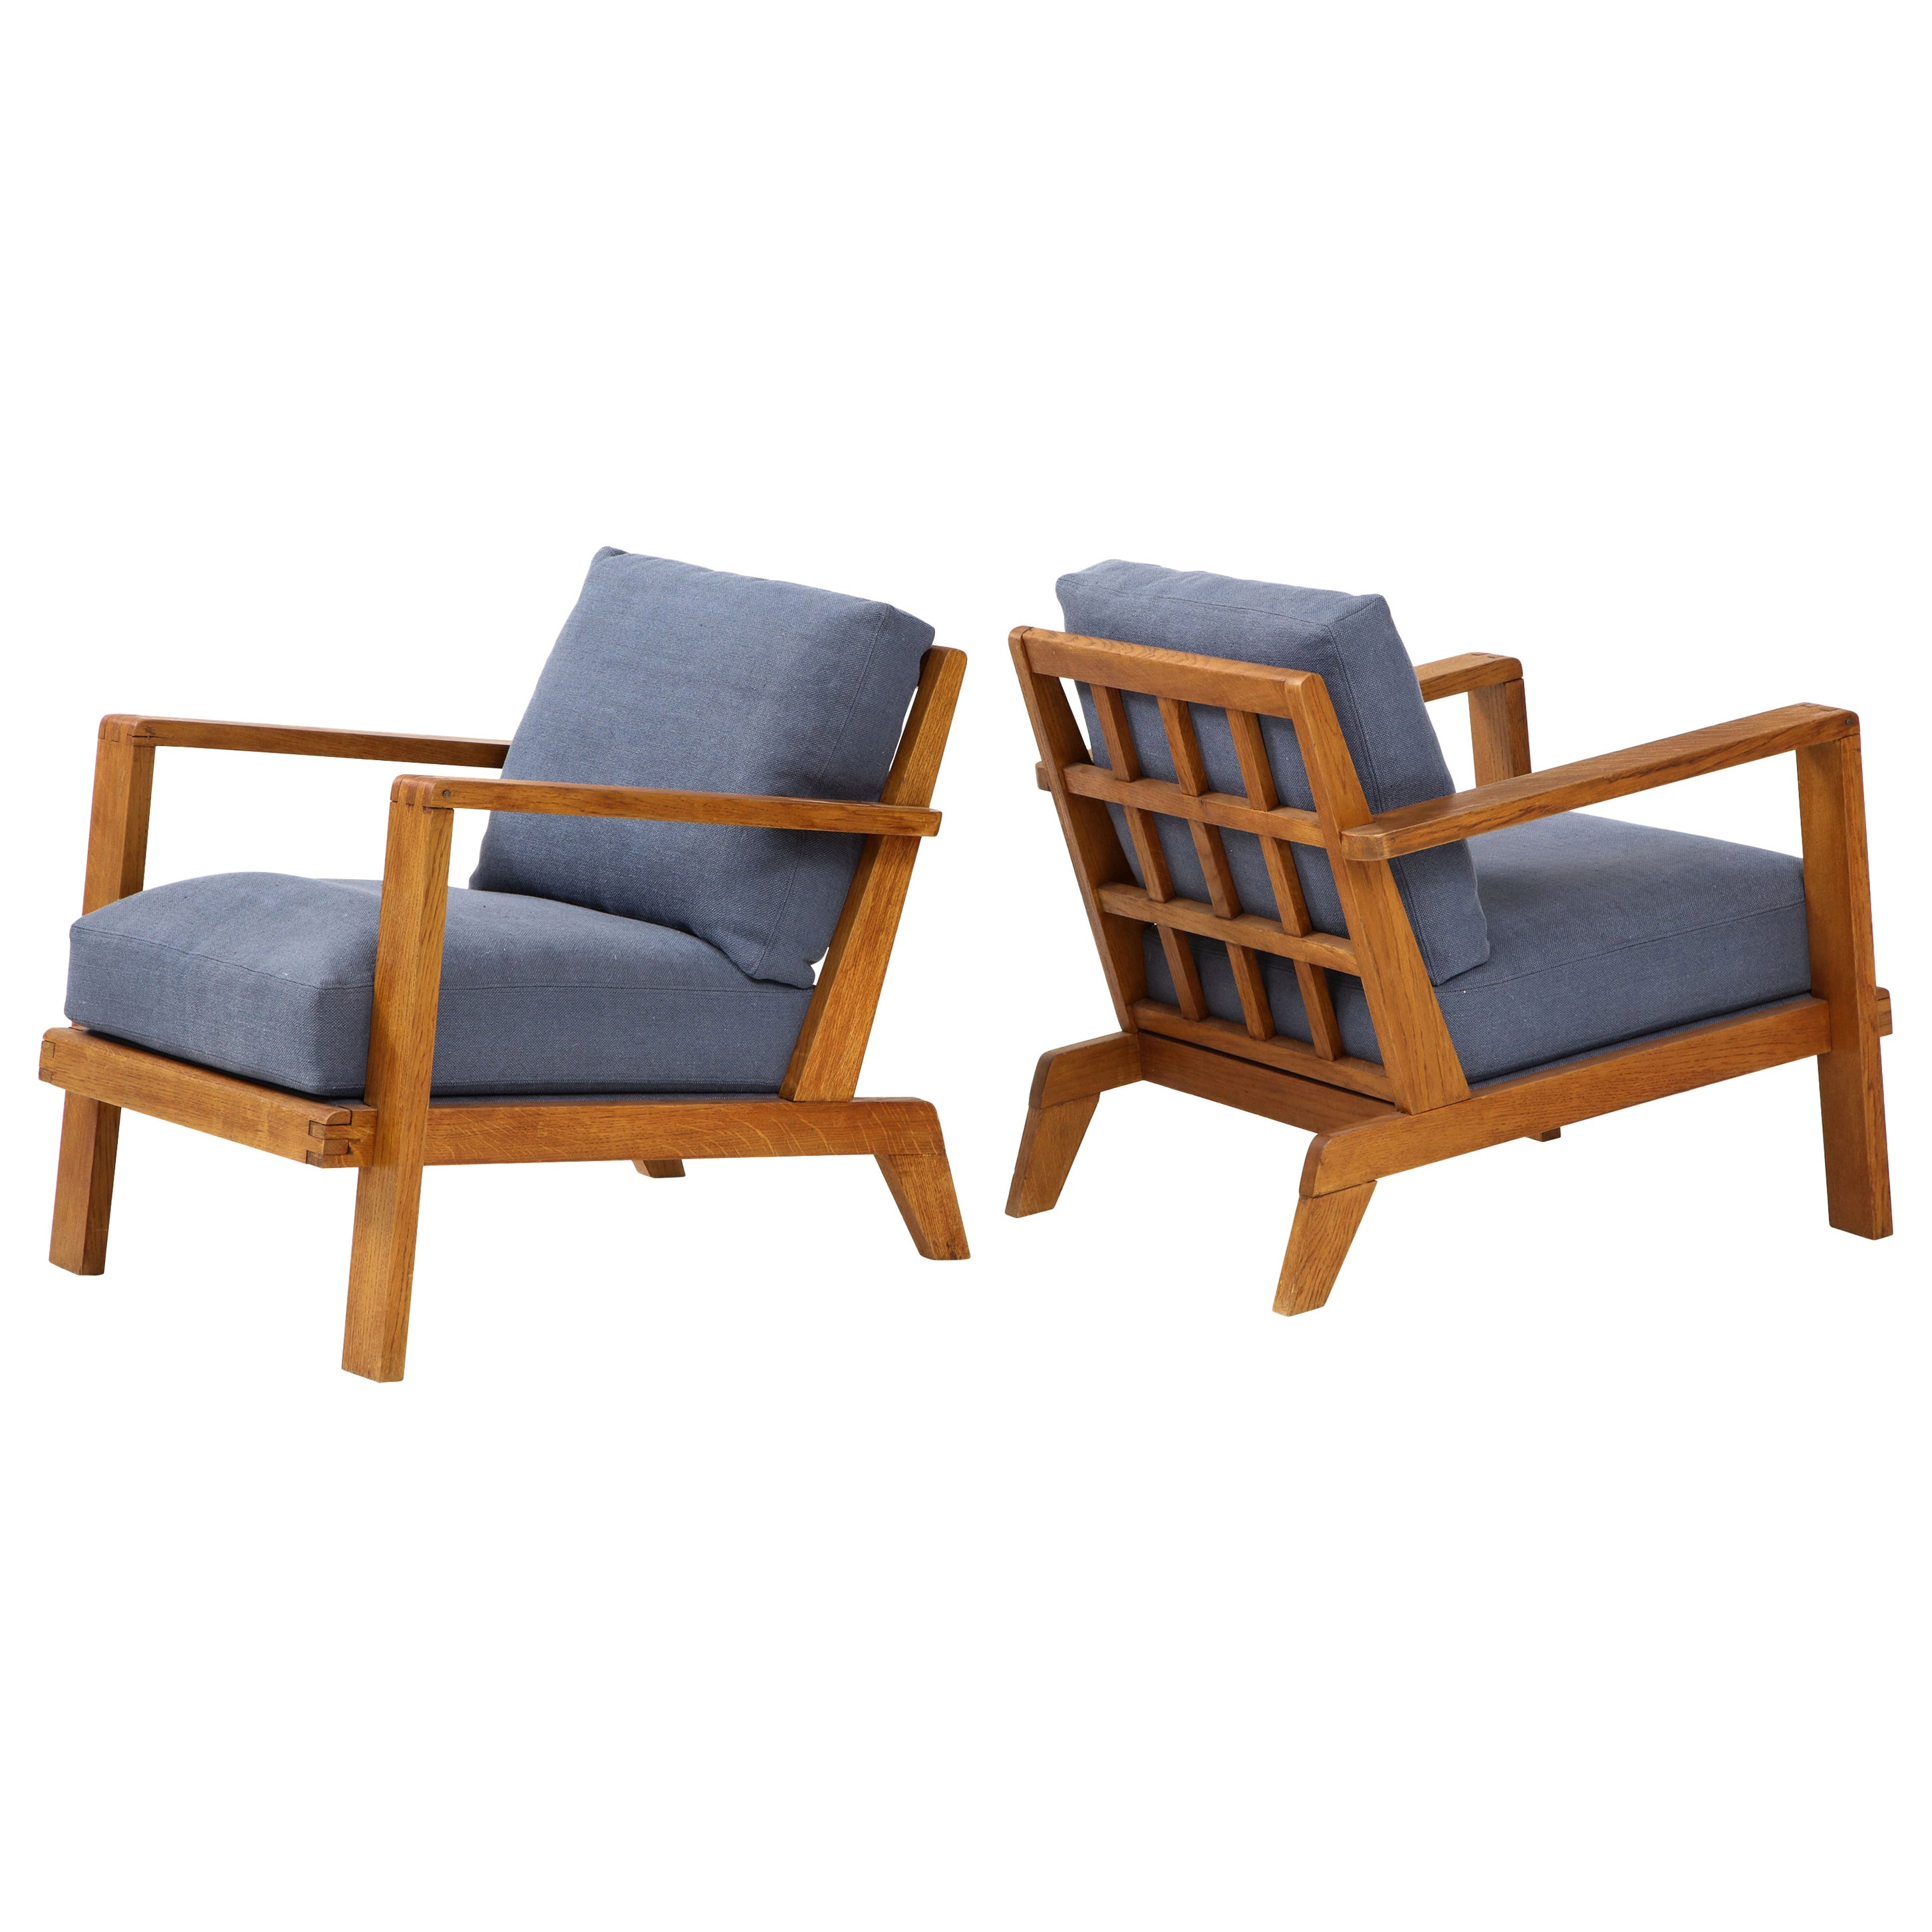 Pair of René Gabriel Oak Armchairs Upholstered in Blue Linen